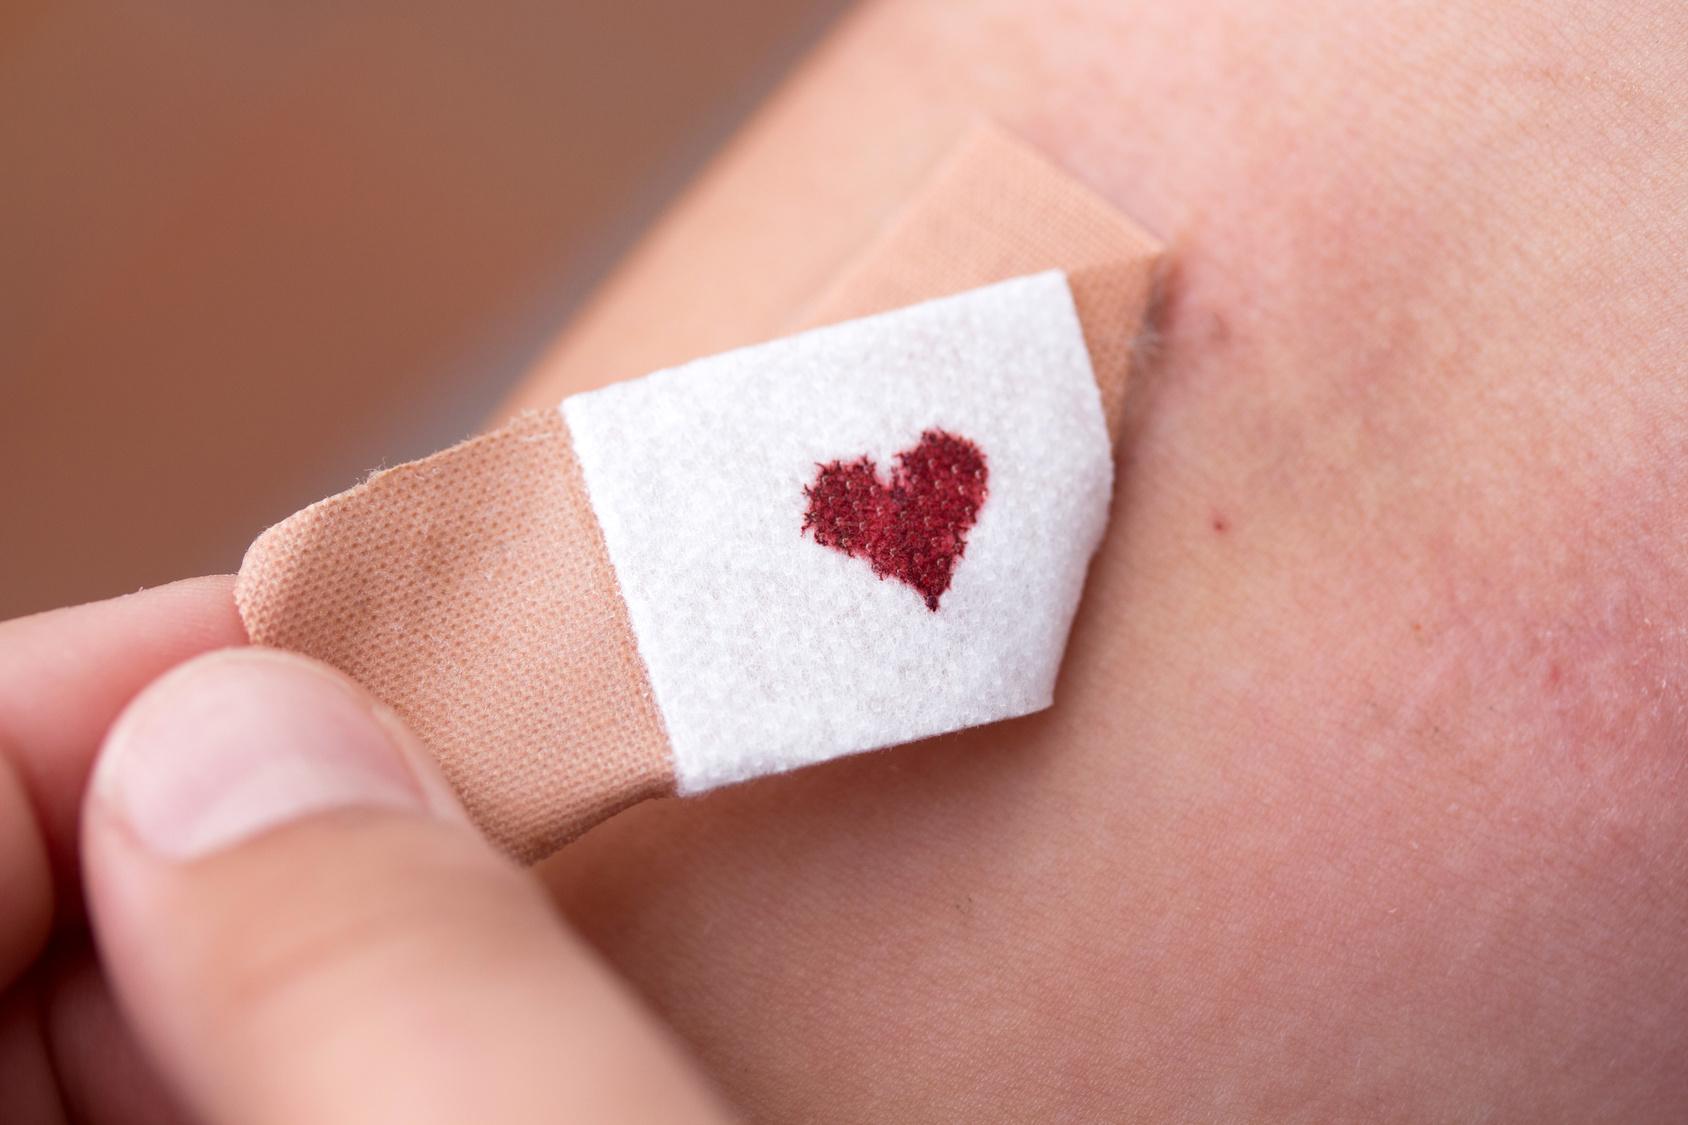 Herz Pflaster Cholesterin